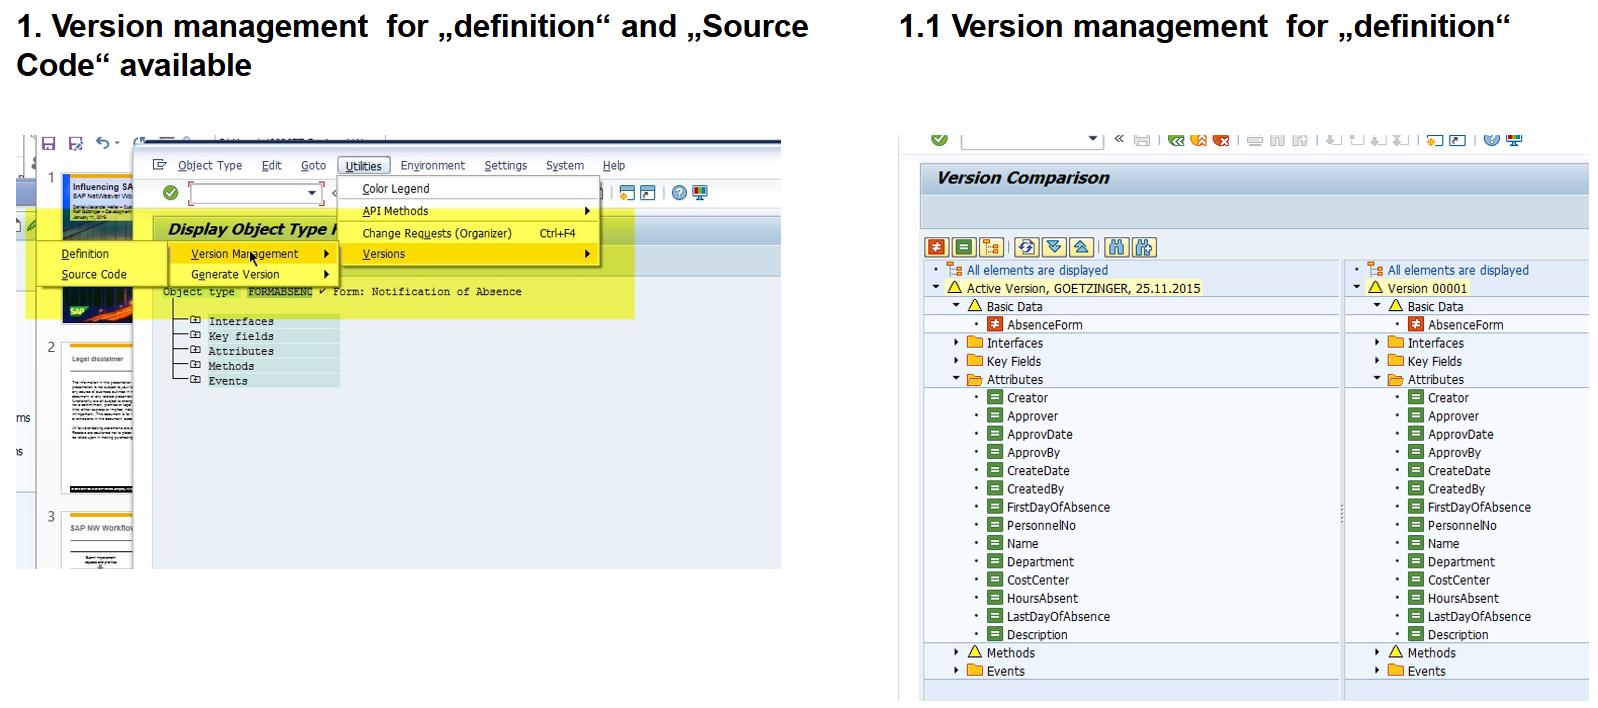 Version management for SWO1 BOR editor